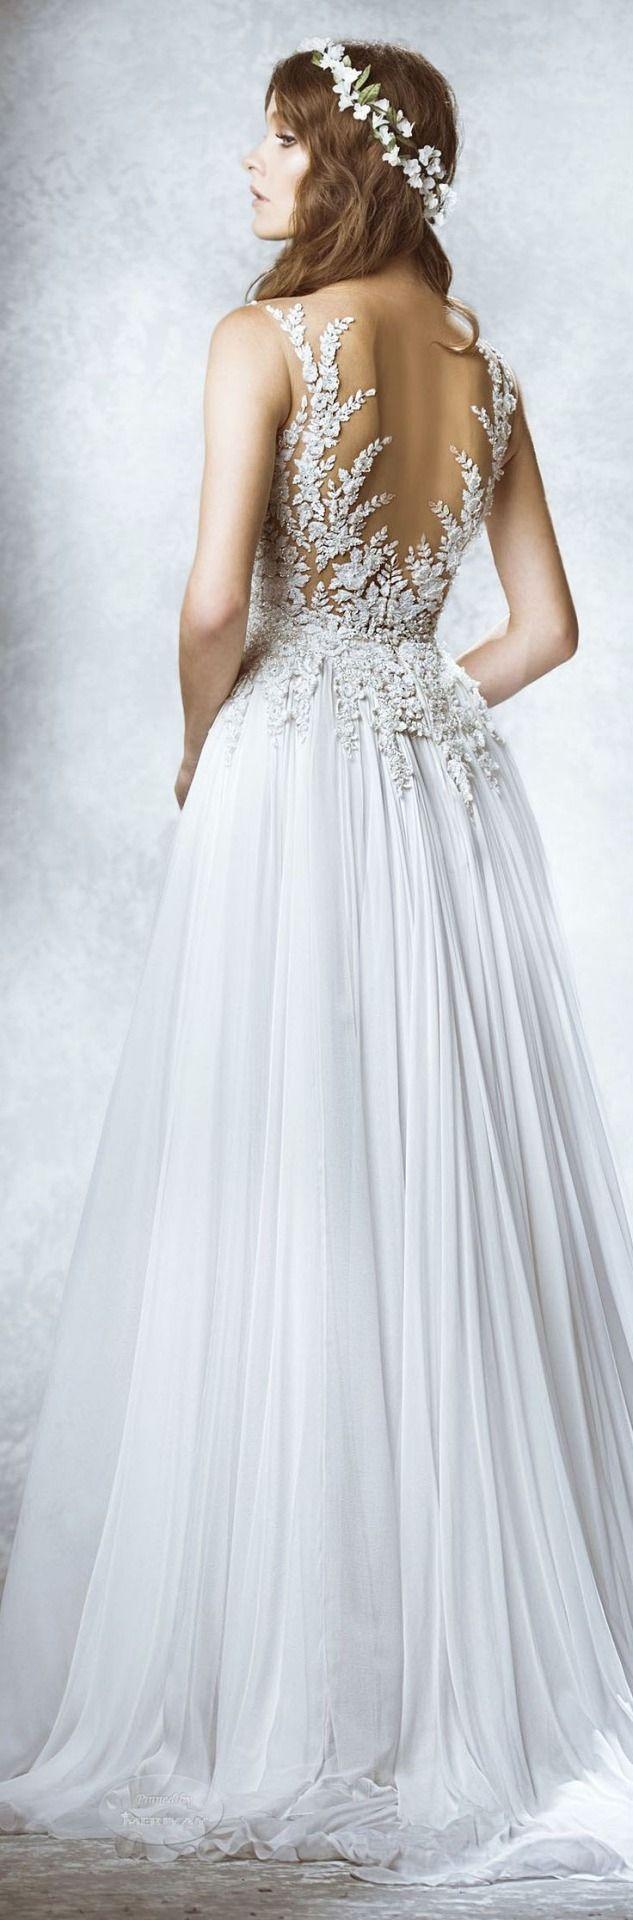 Gorgeous open back wedding dress - found on tumblr   FANCY ...